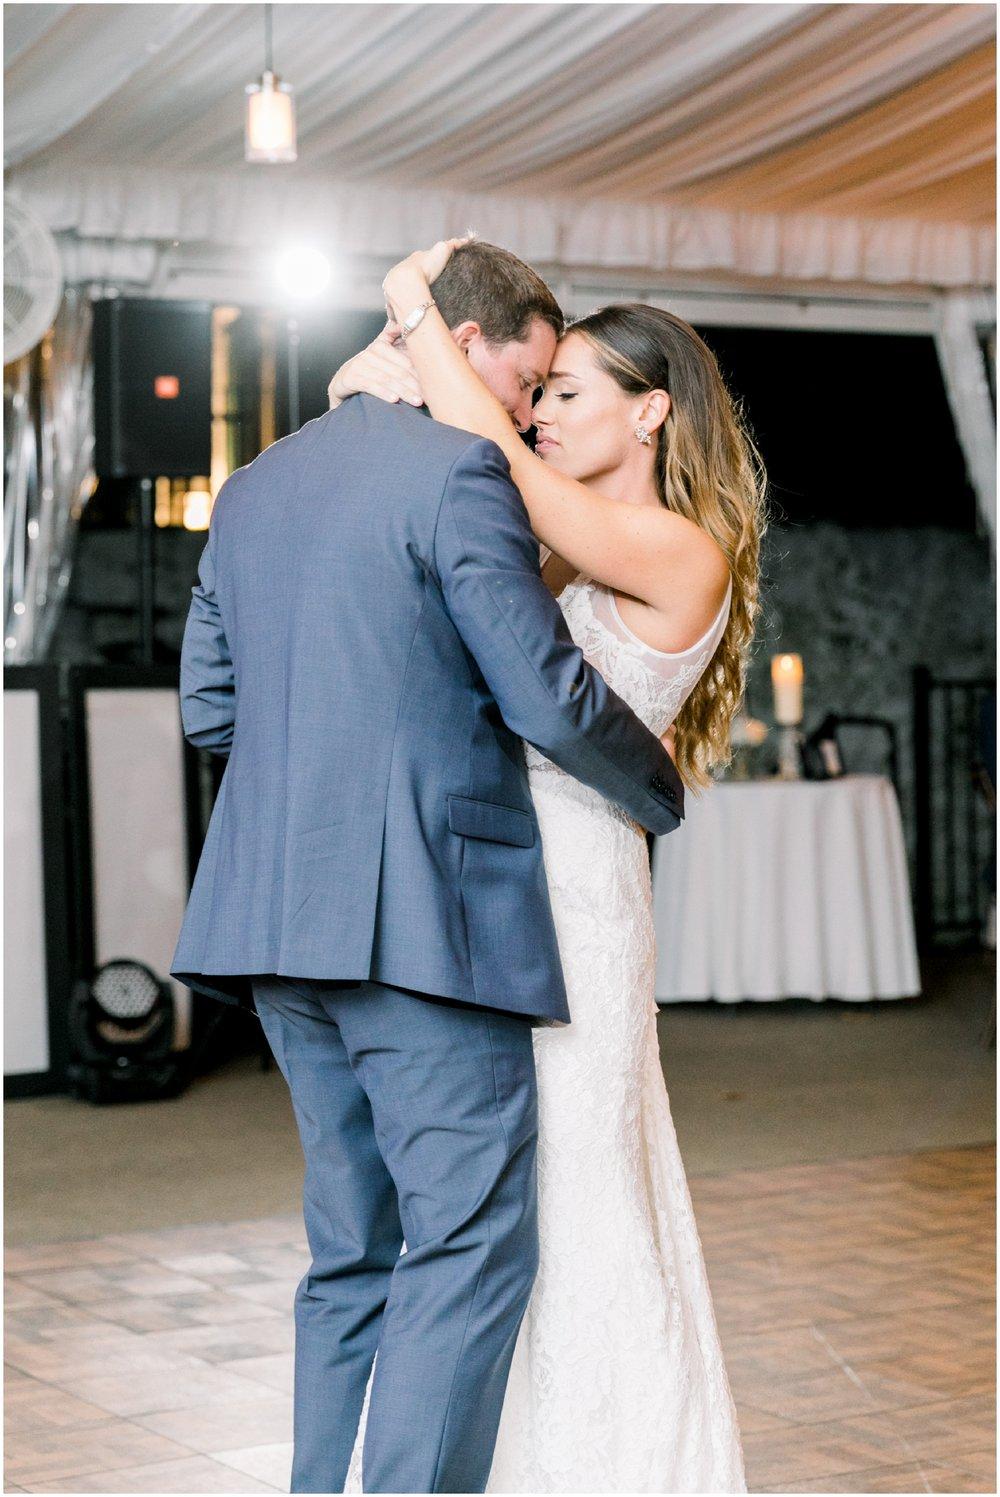 Summer Wedding at Philander Chase Knox Estate in Malvern, PA - Krista Brackin Photography_0169.jpg